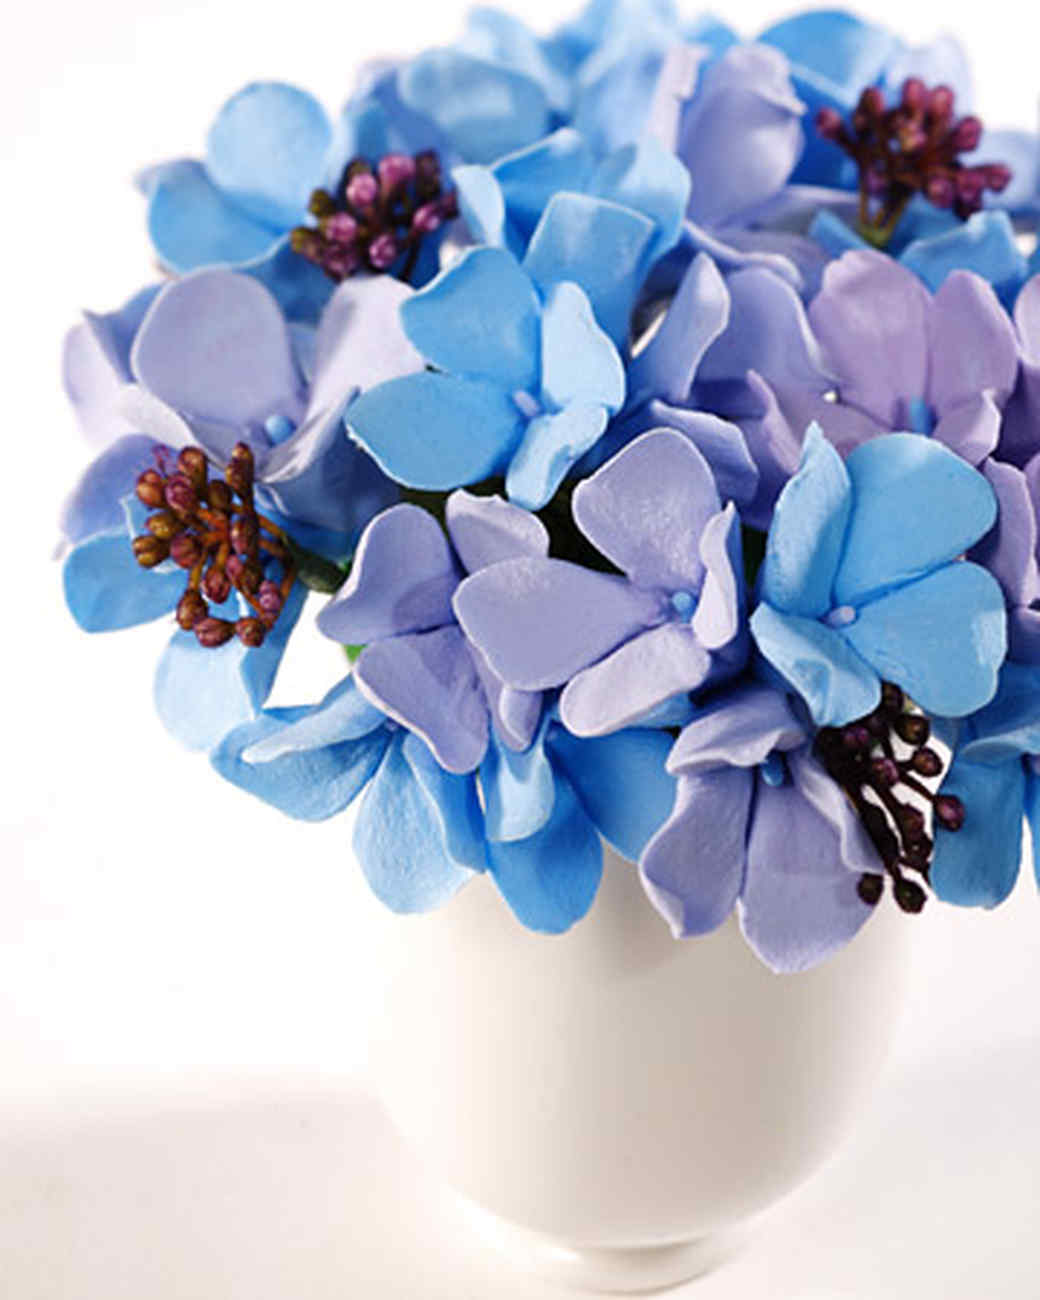 3148_040108_clayflowers.jpg